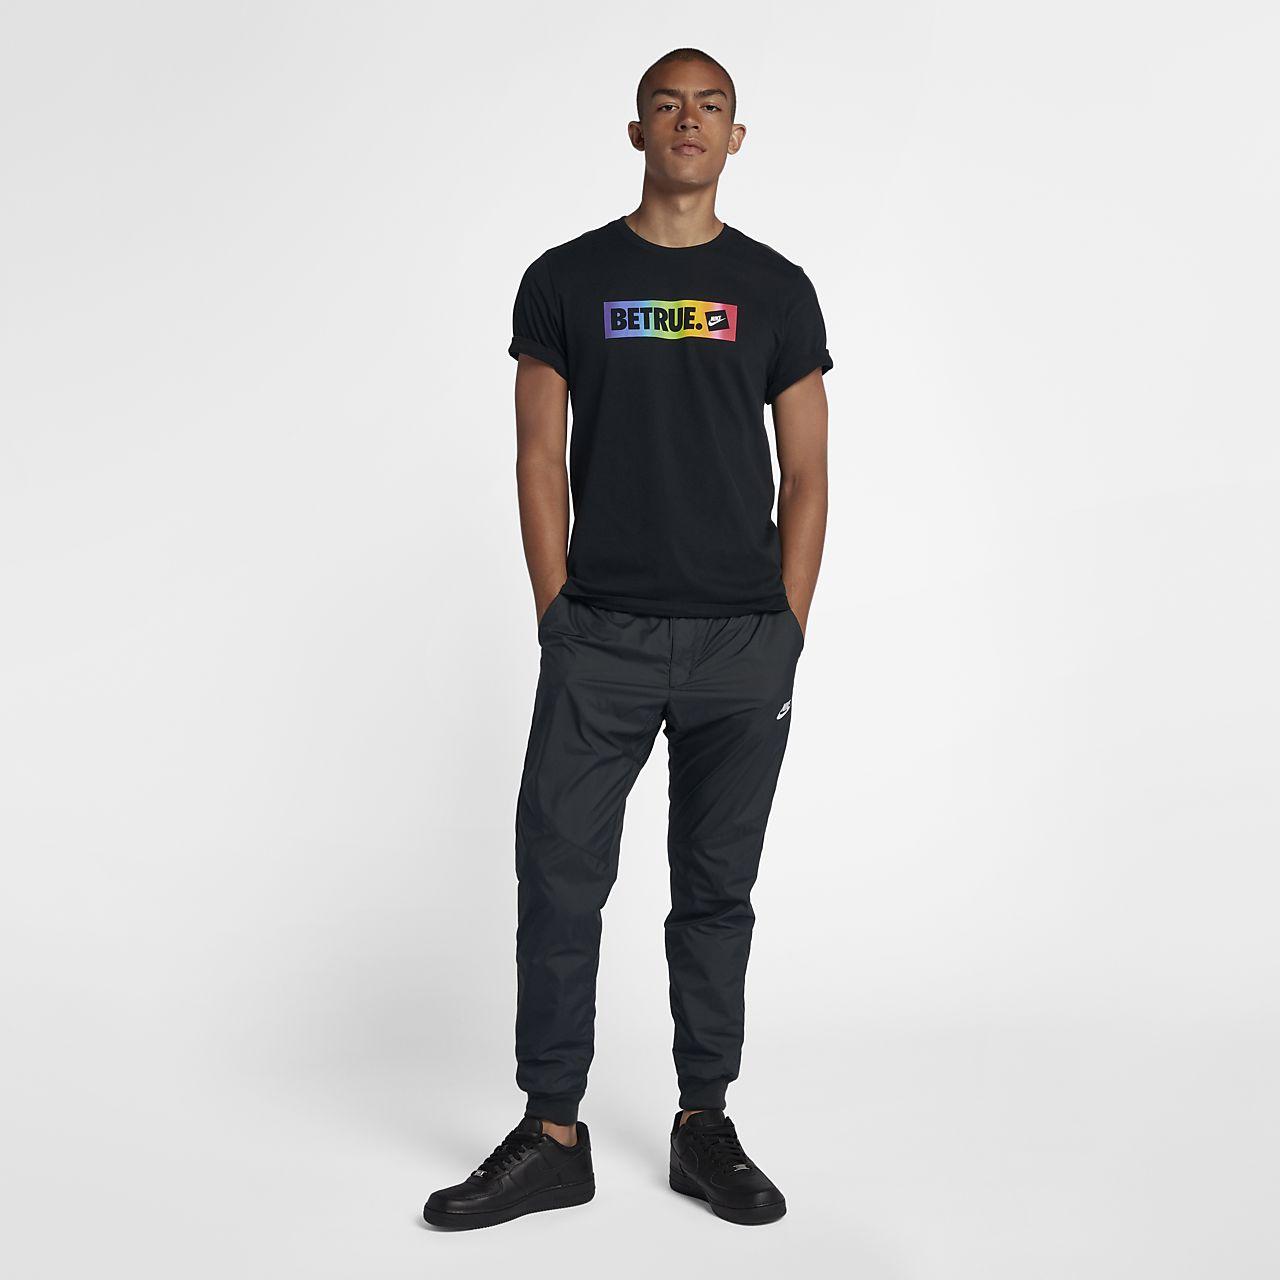 2aaff7d647099b Nike Sportswear BETRUE Men s T-Shirt. Nike.com CA